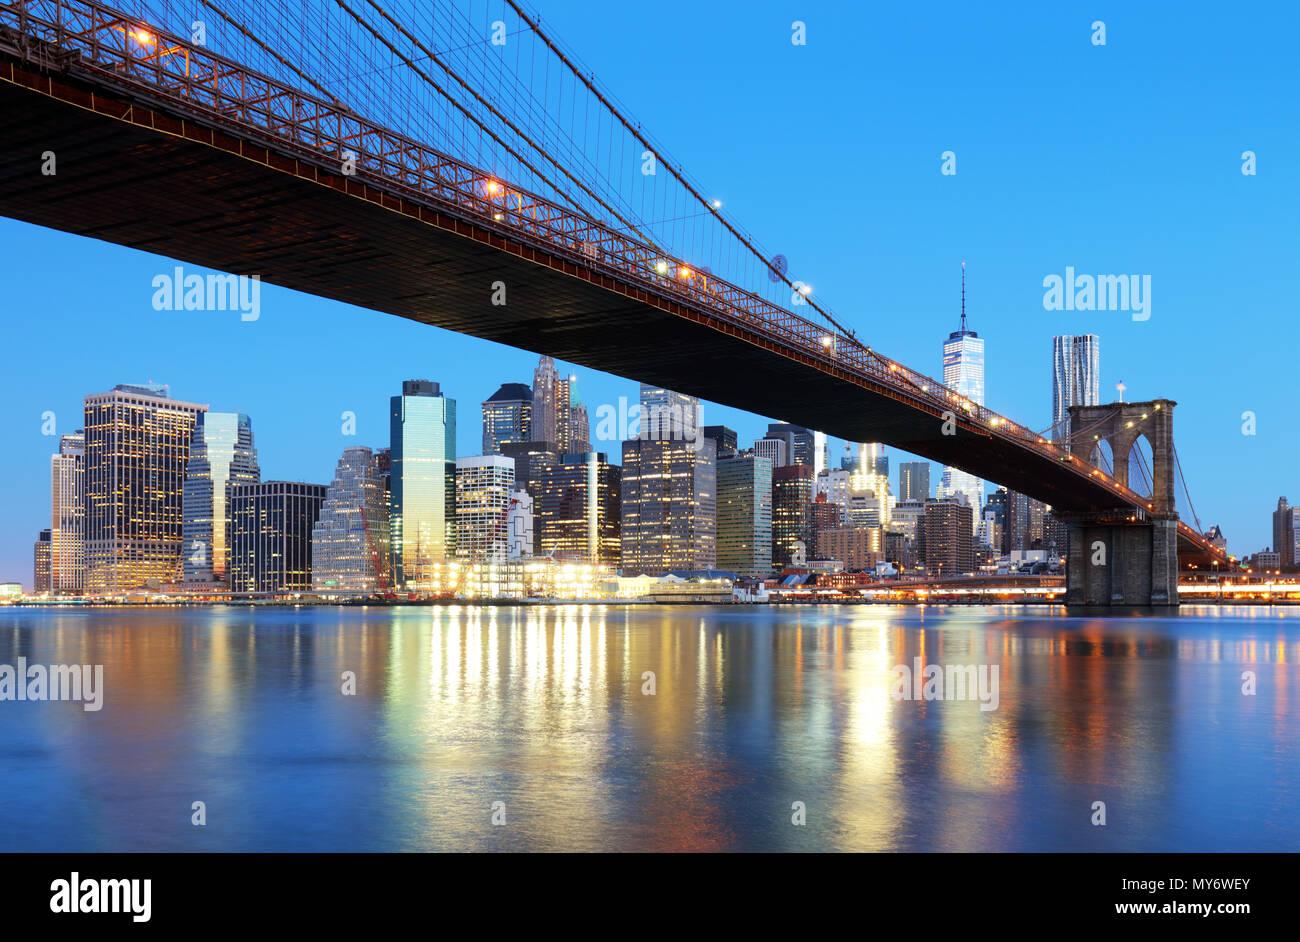 New York, USA Photo Stock